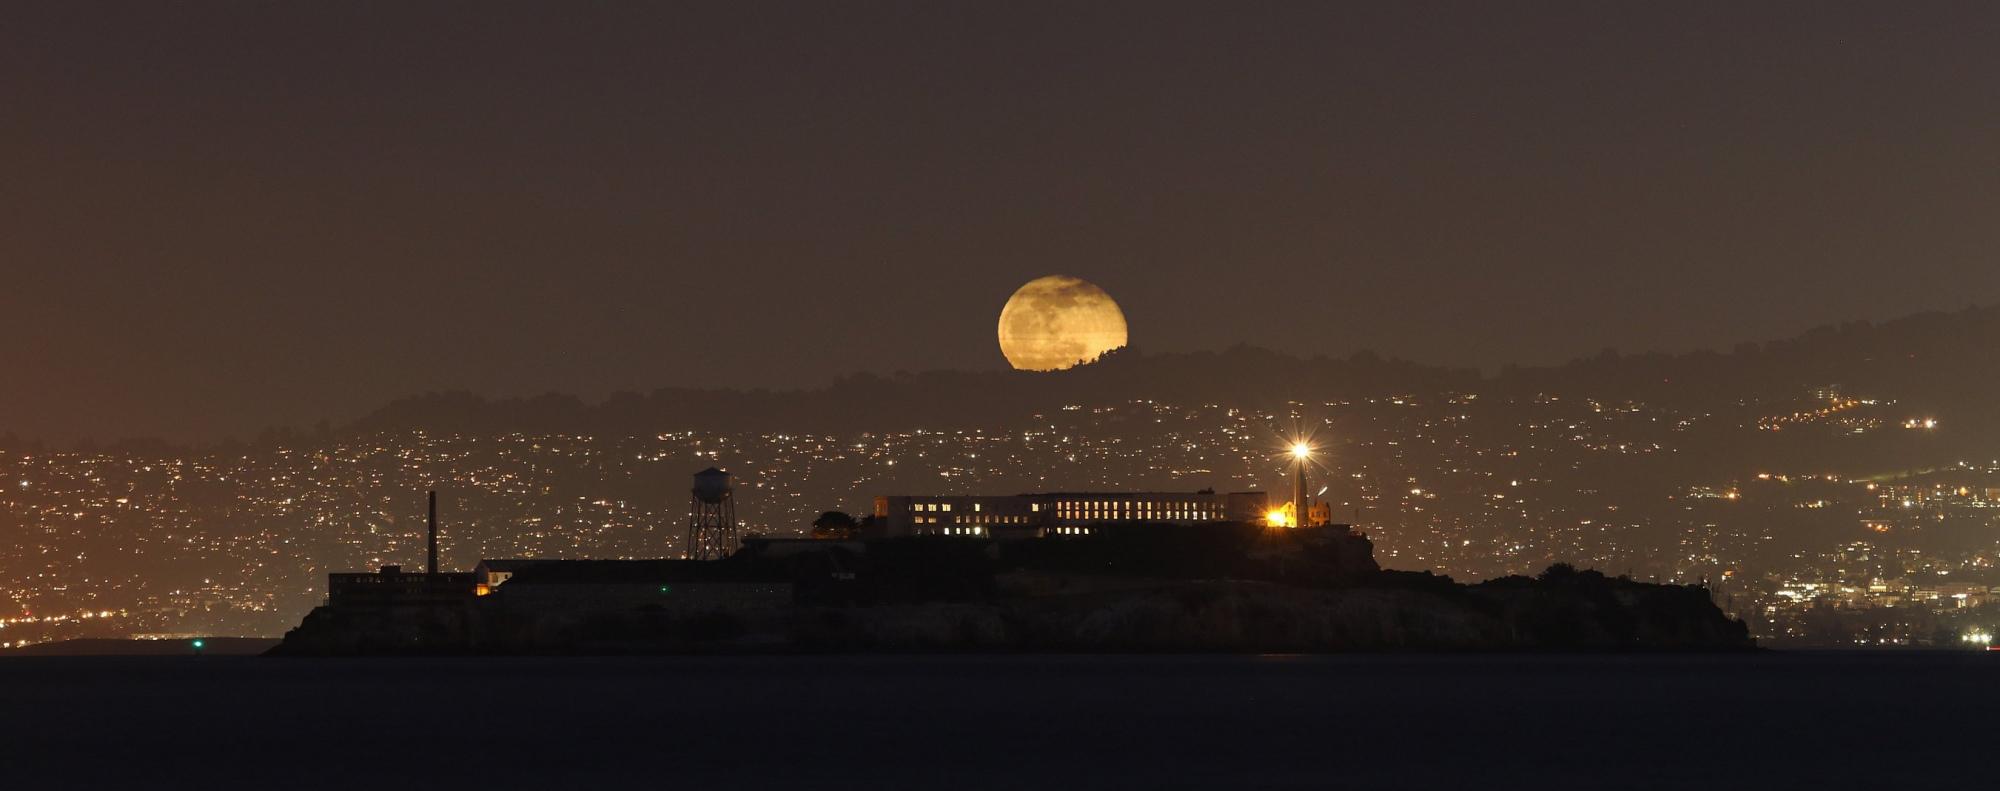 lever alcatraz paysage 50%.jpg